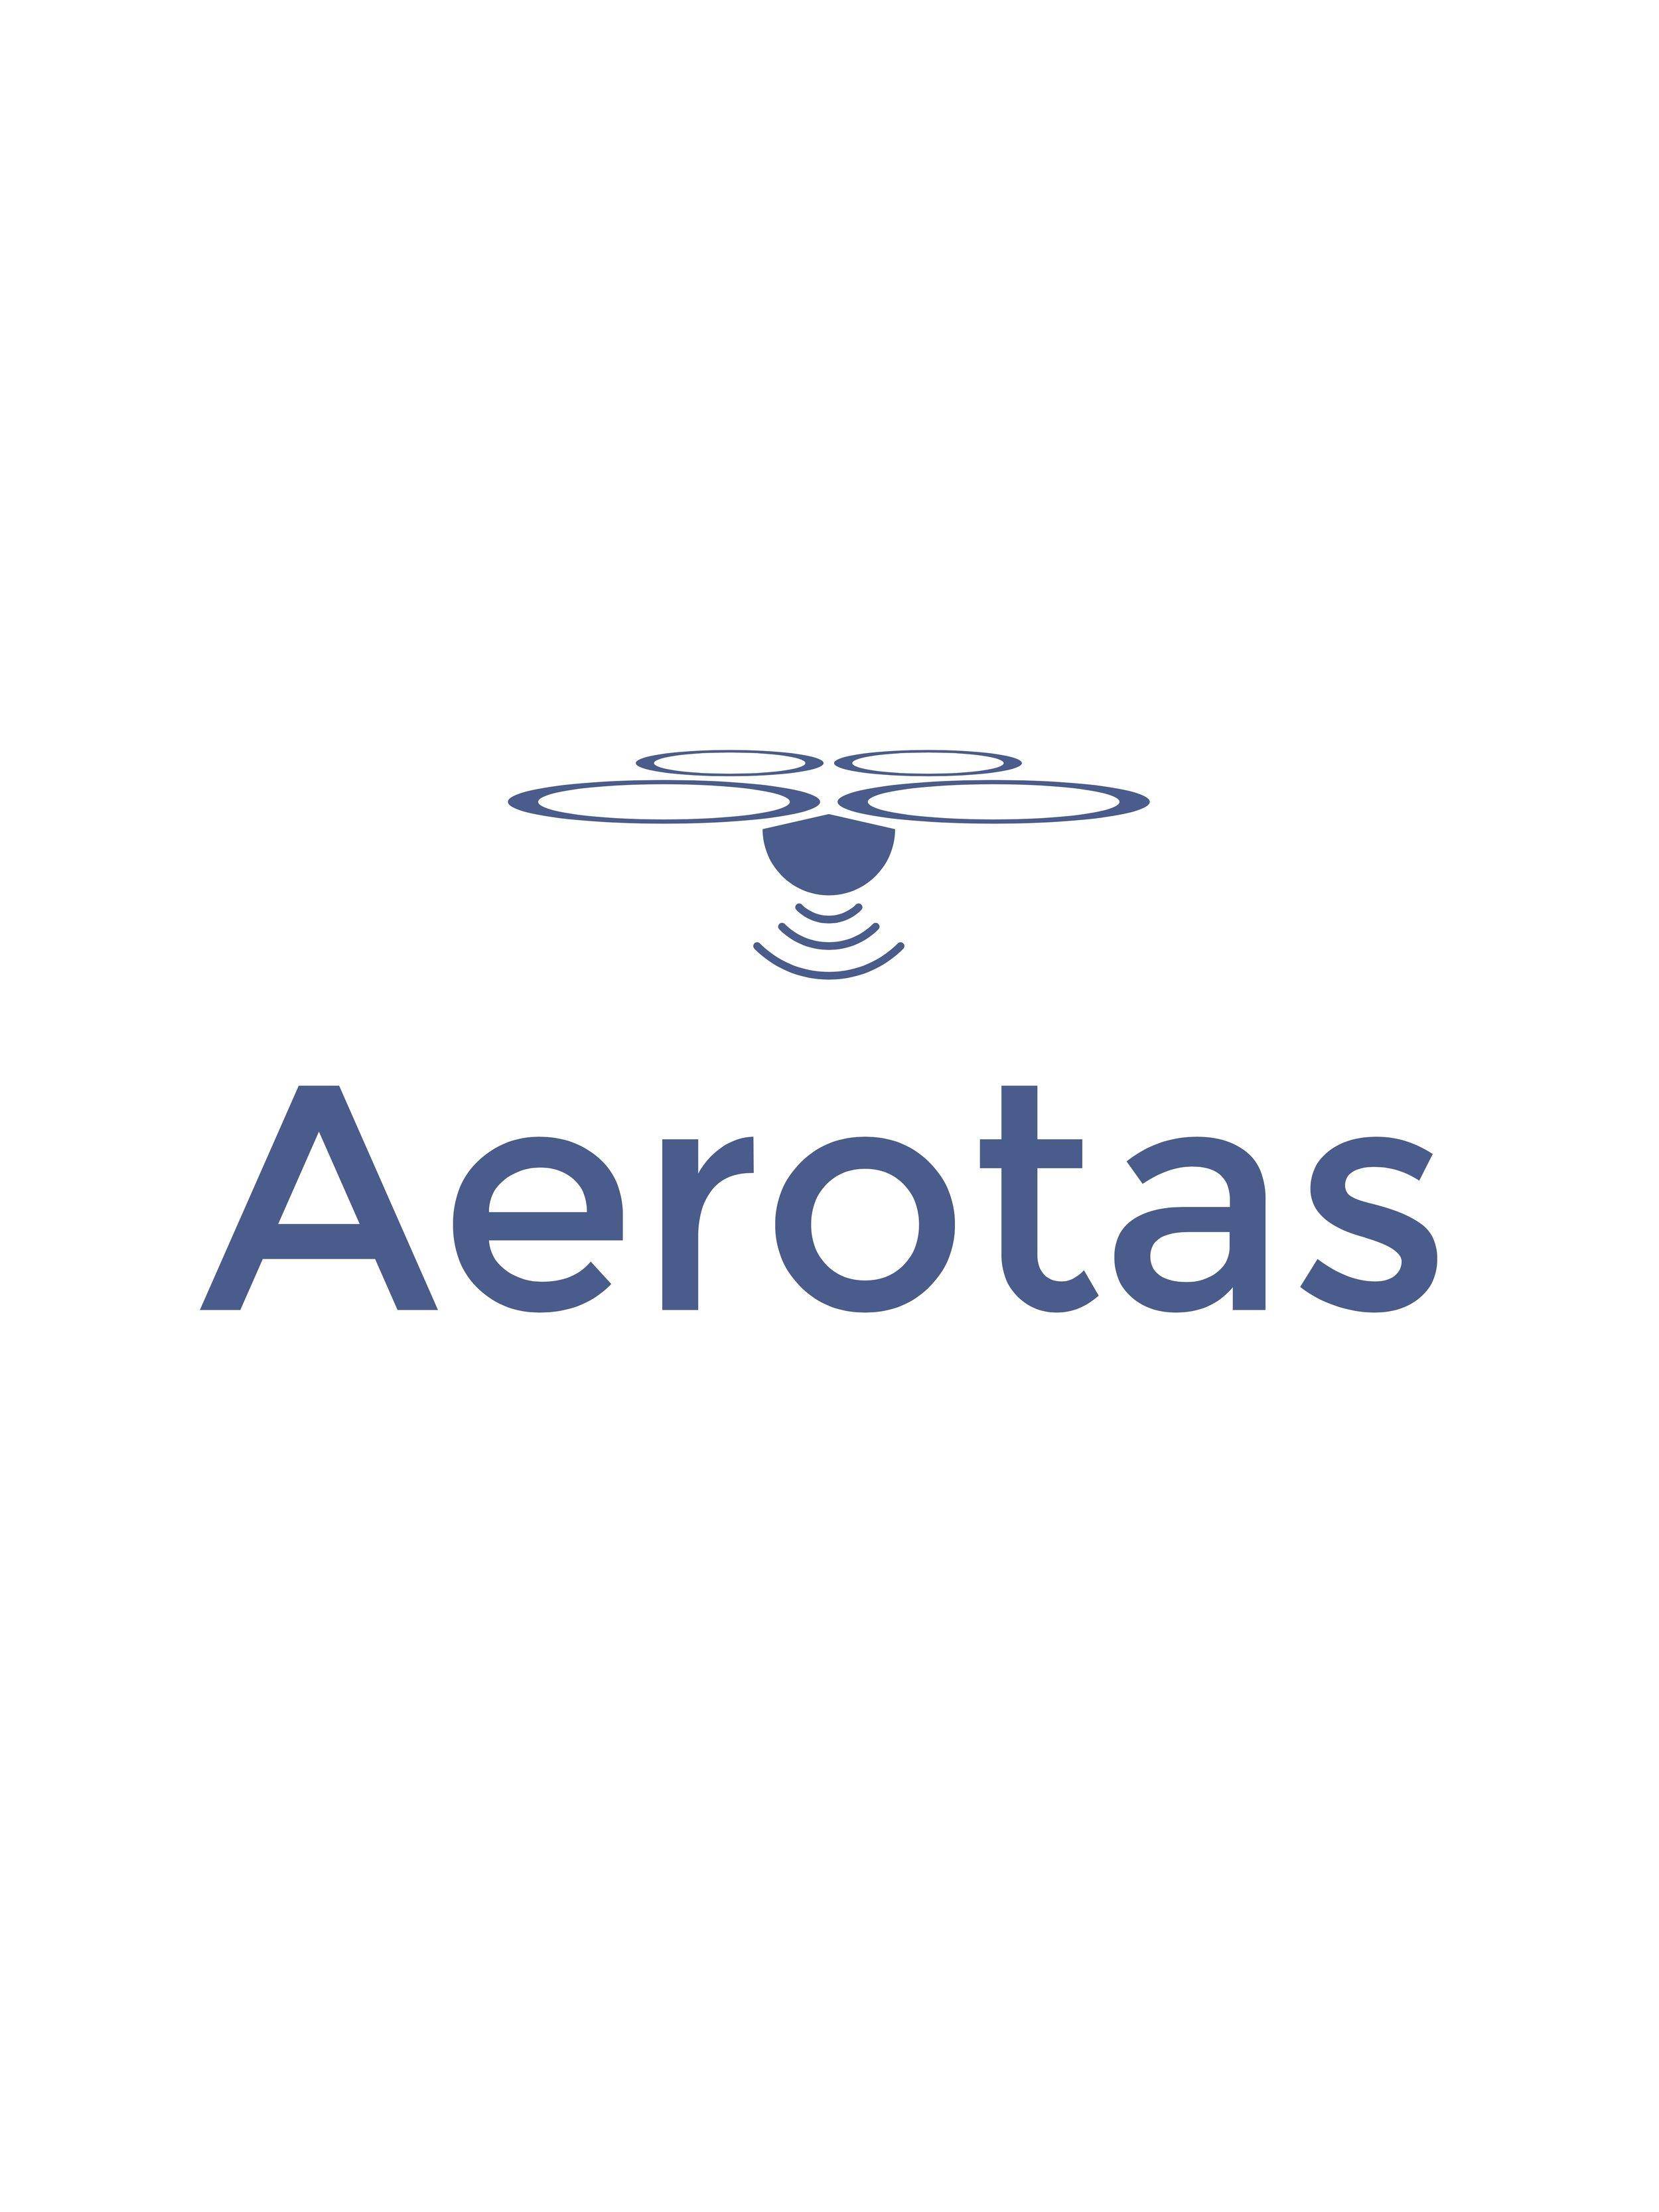 Aerotas 1 (Blue White Background).jpg